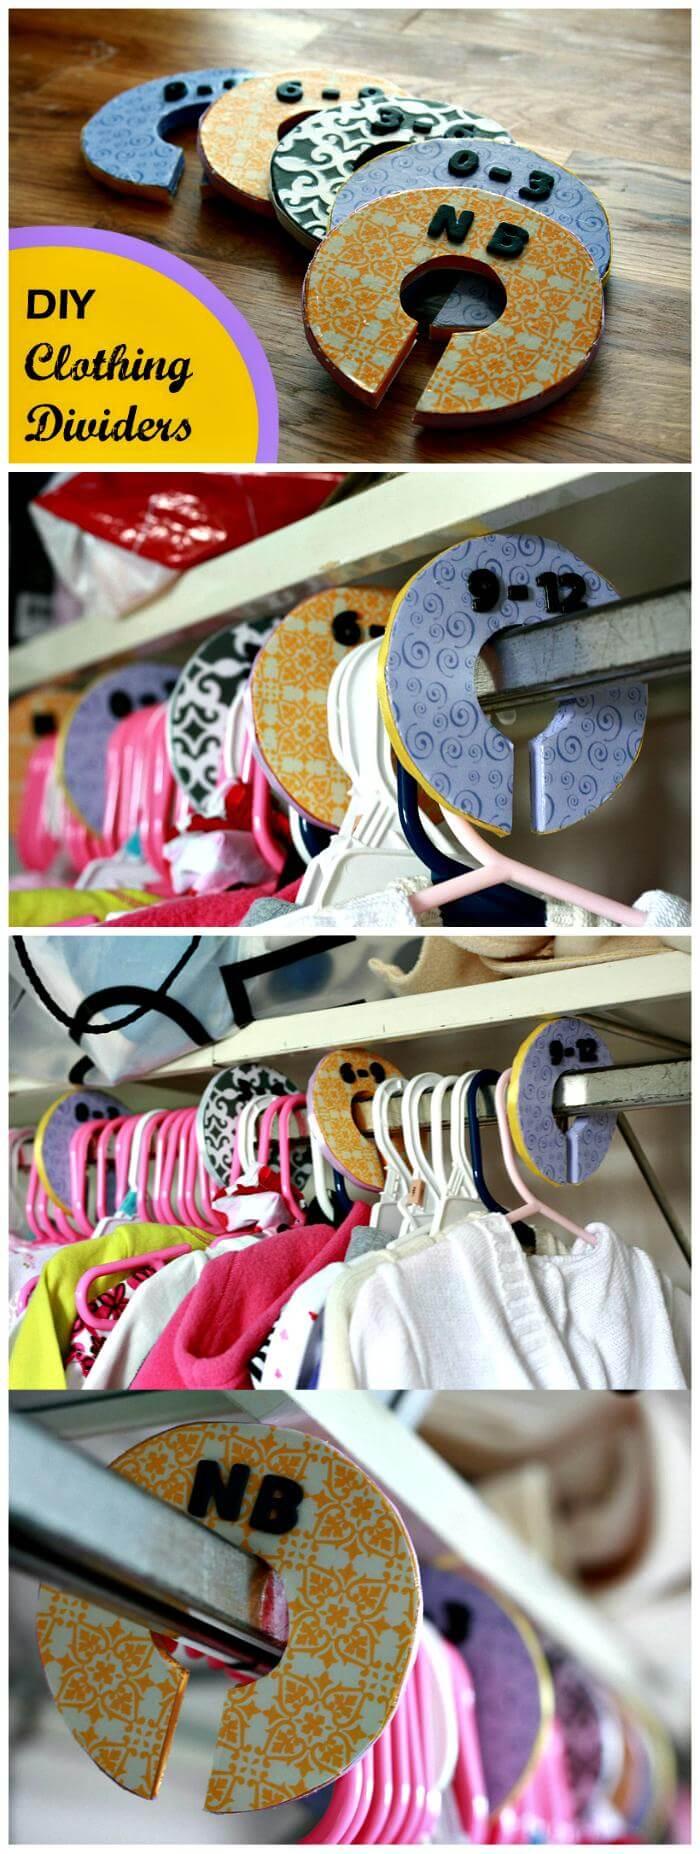 DIY Clothing Dividers